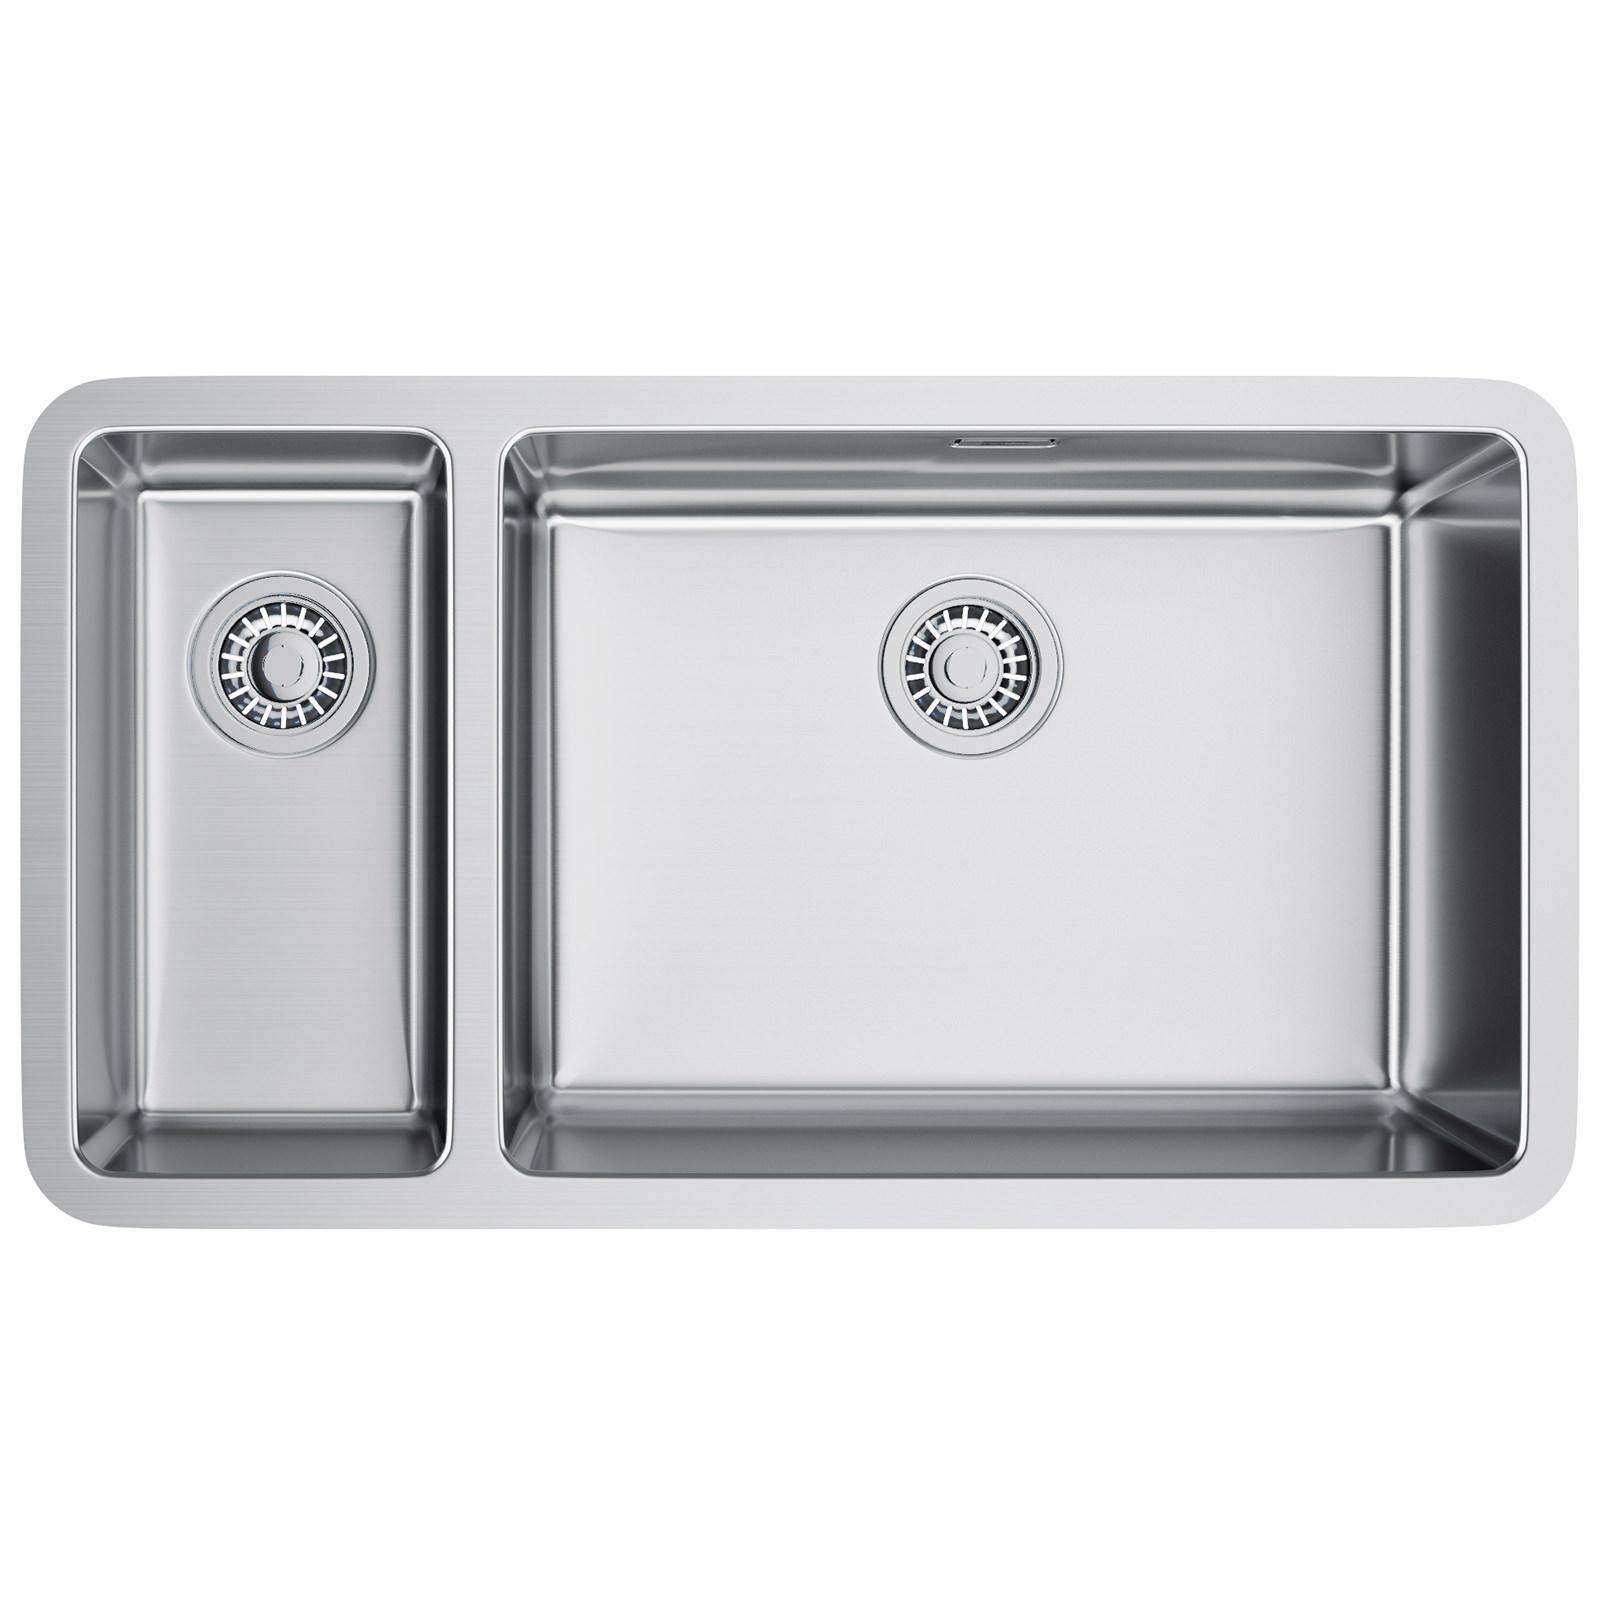 Franke Kubus Undermount Sink : Franke Kubus KBX 160 55-20 Stainless Steel 1.5 Bowl Undermount Sink ...